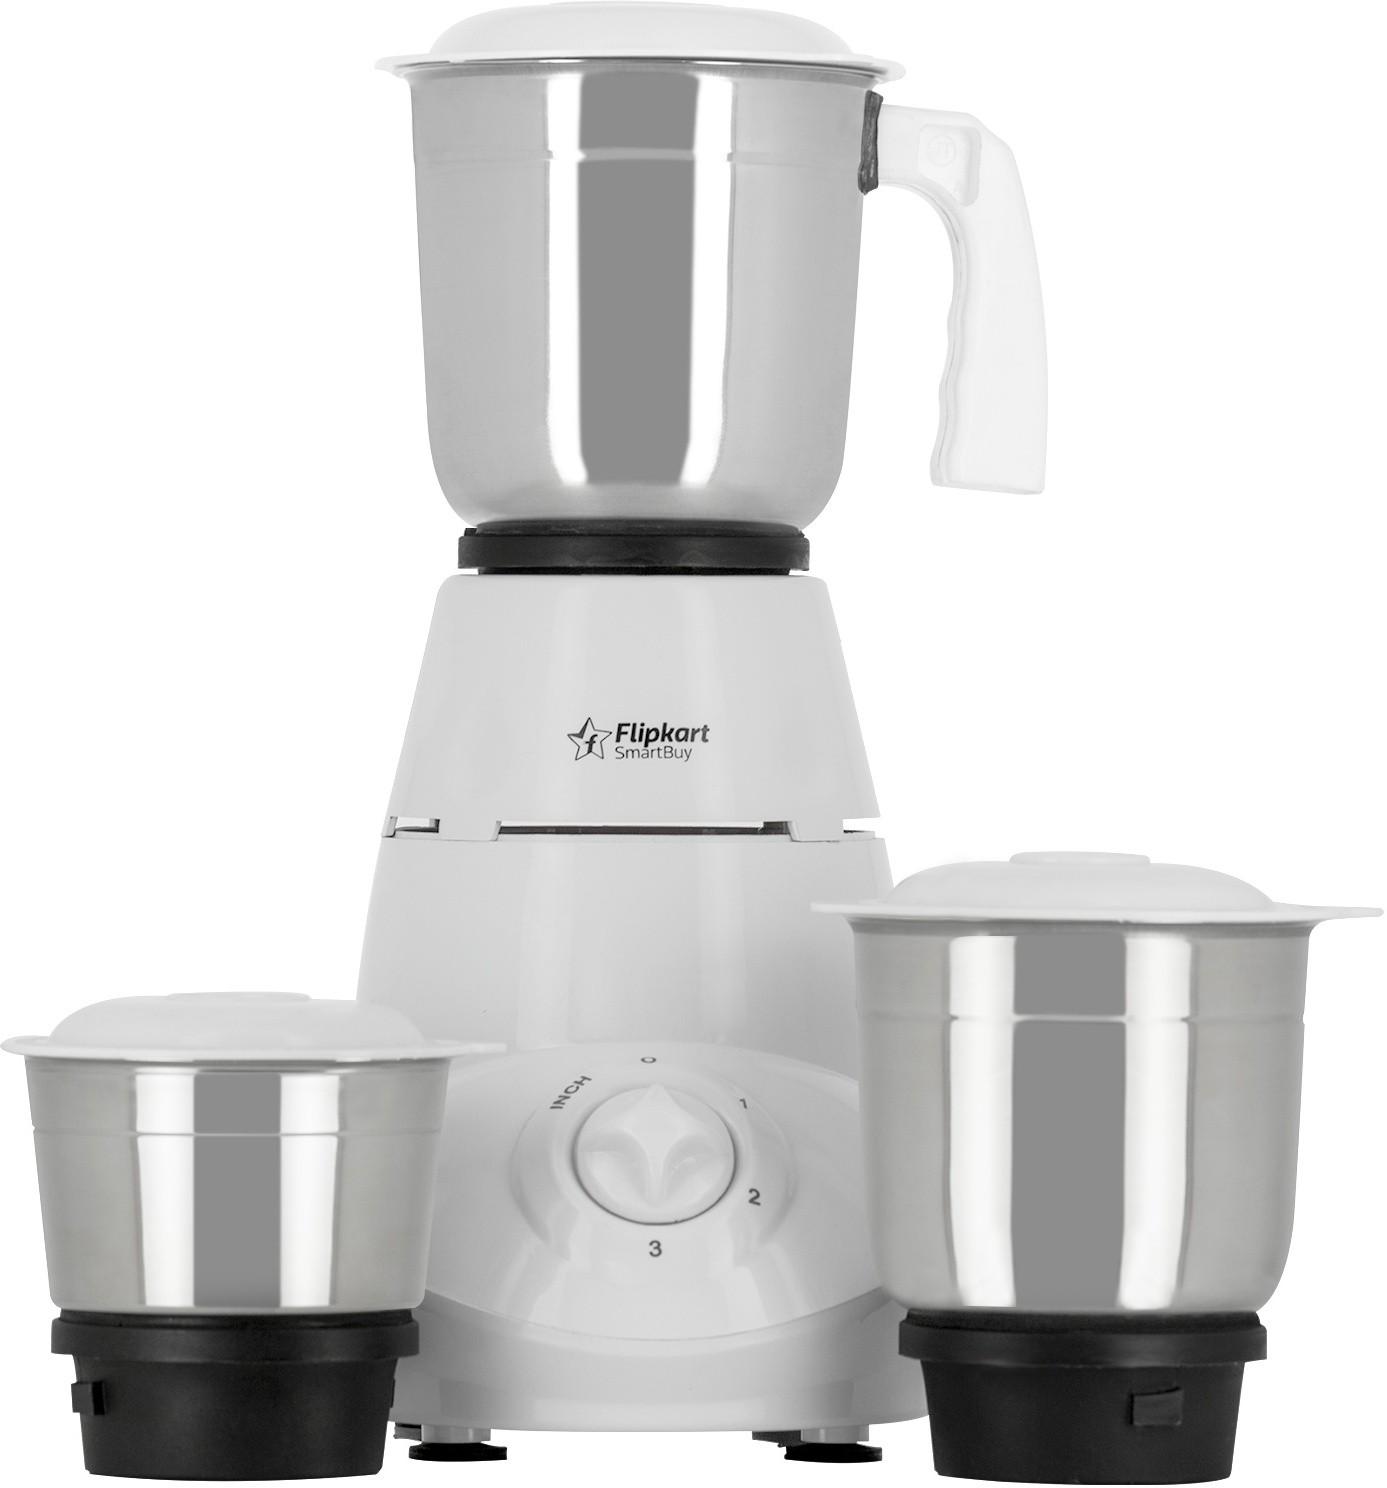 Flipkart SmartBuy Classico 500 W Mixer Grinder(White, 3 Jars)